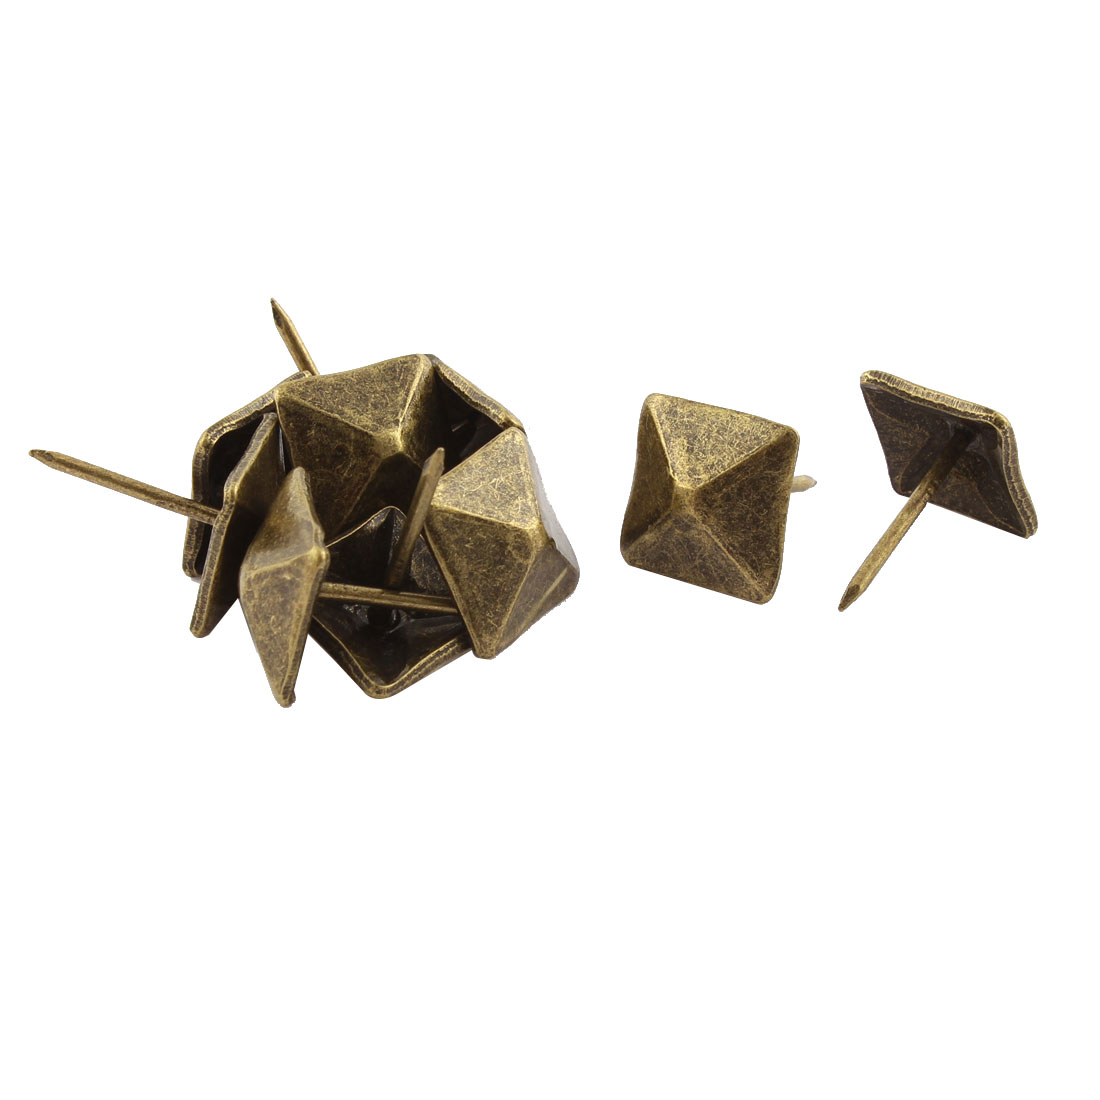 1.4cm Metal Square Pin Furniture Decorative Domed Nails Bronze Tone 10Pcs